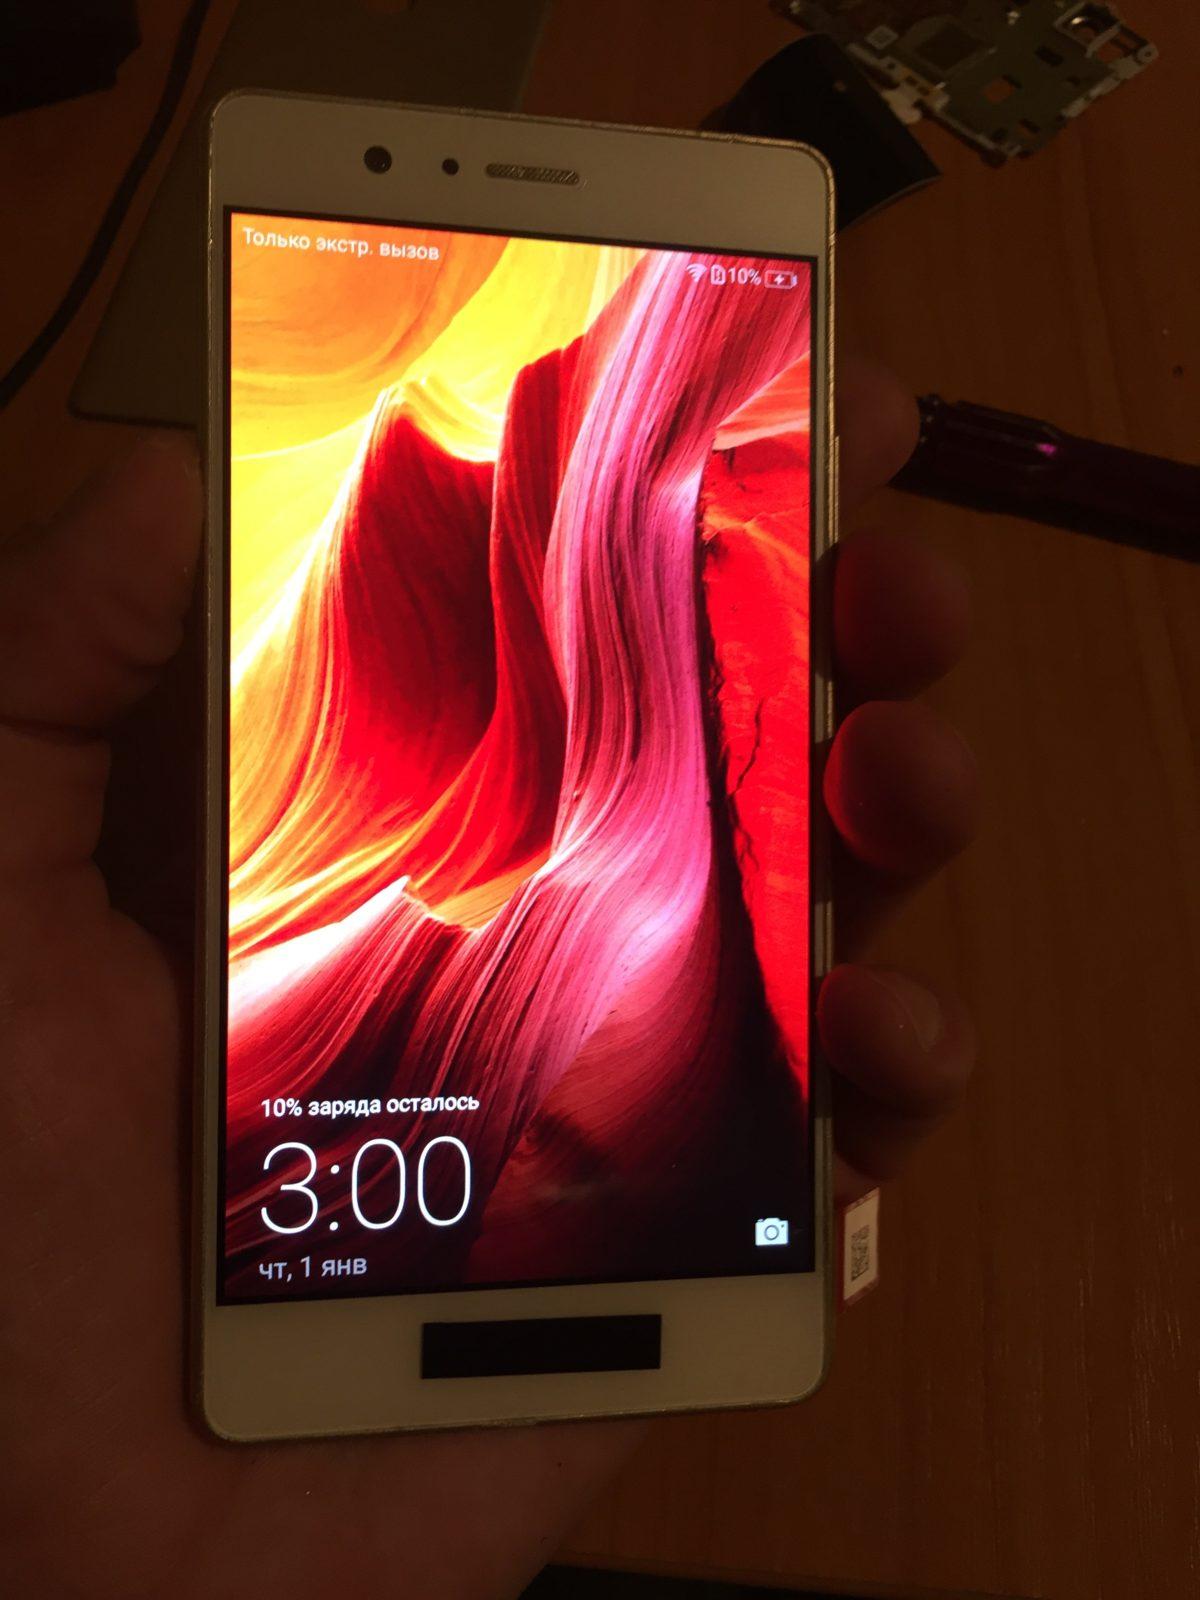 Huawei p9 lite разбор и замена дисплея с разбитым стеклом